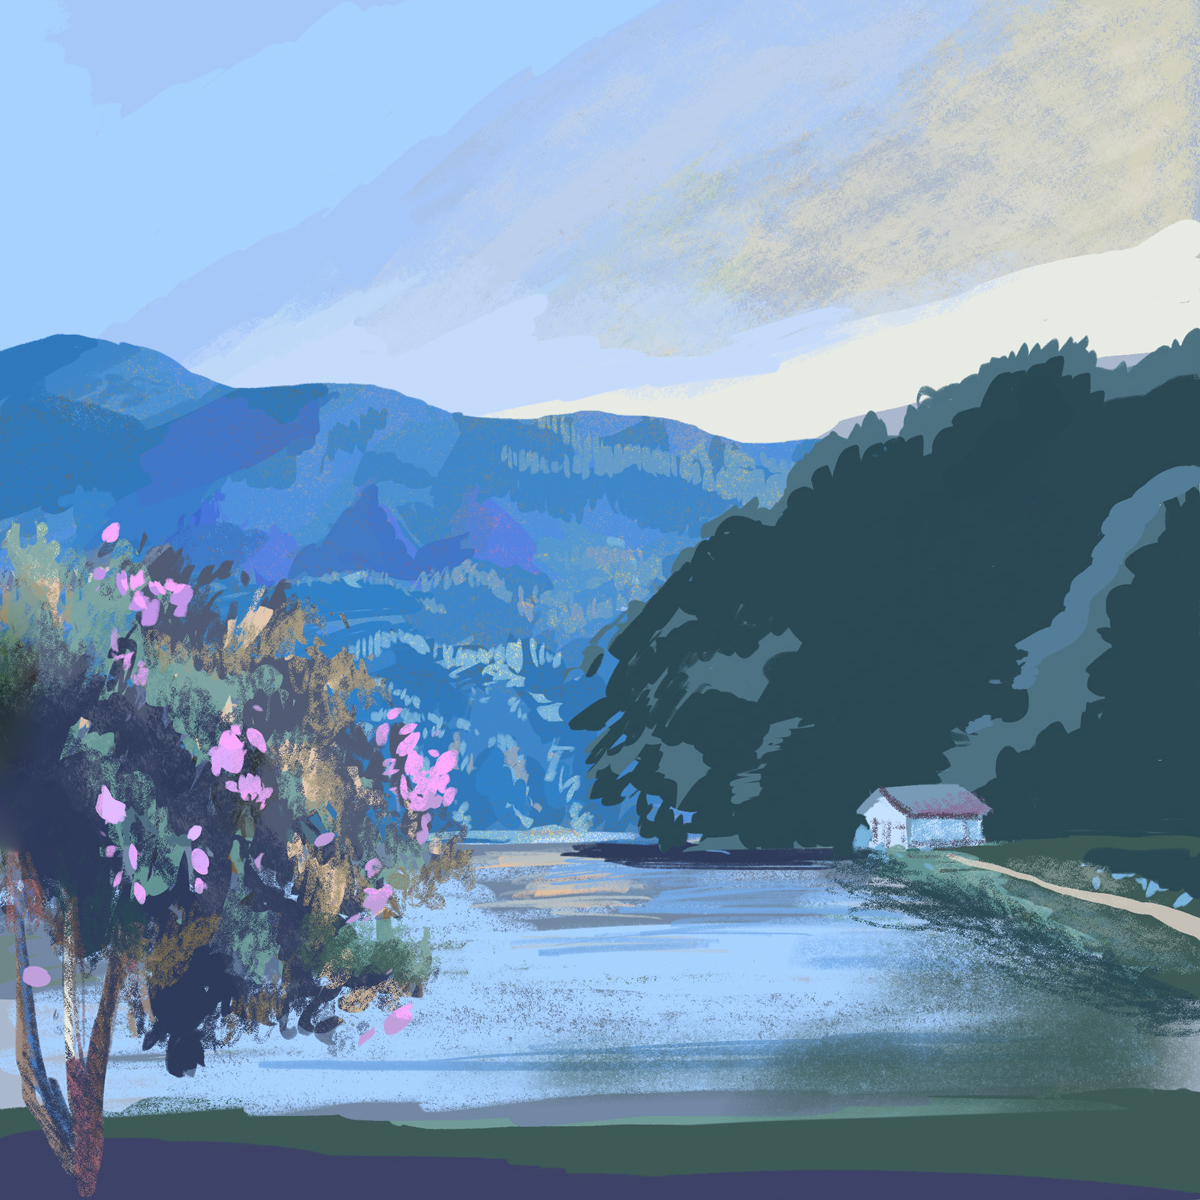 Morning plein air digital painting of Lake Lure, North Carolina.